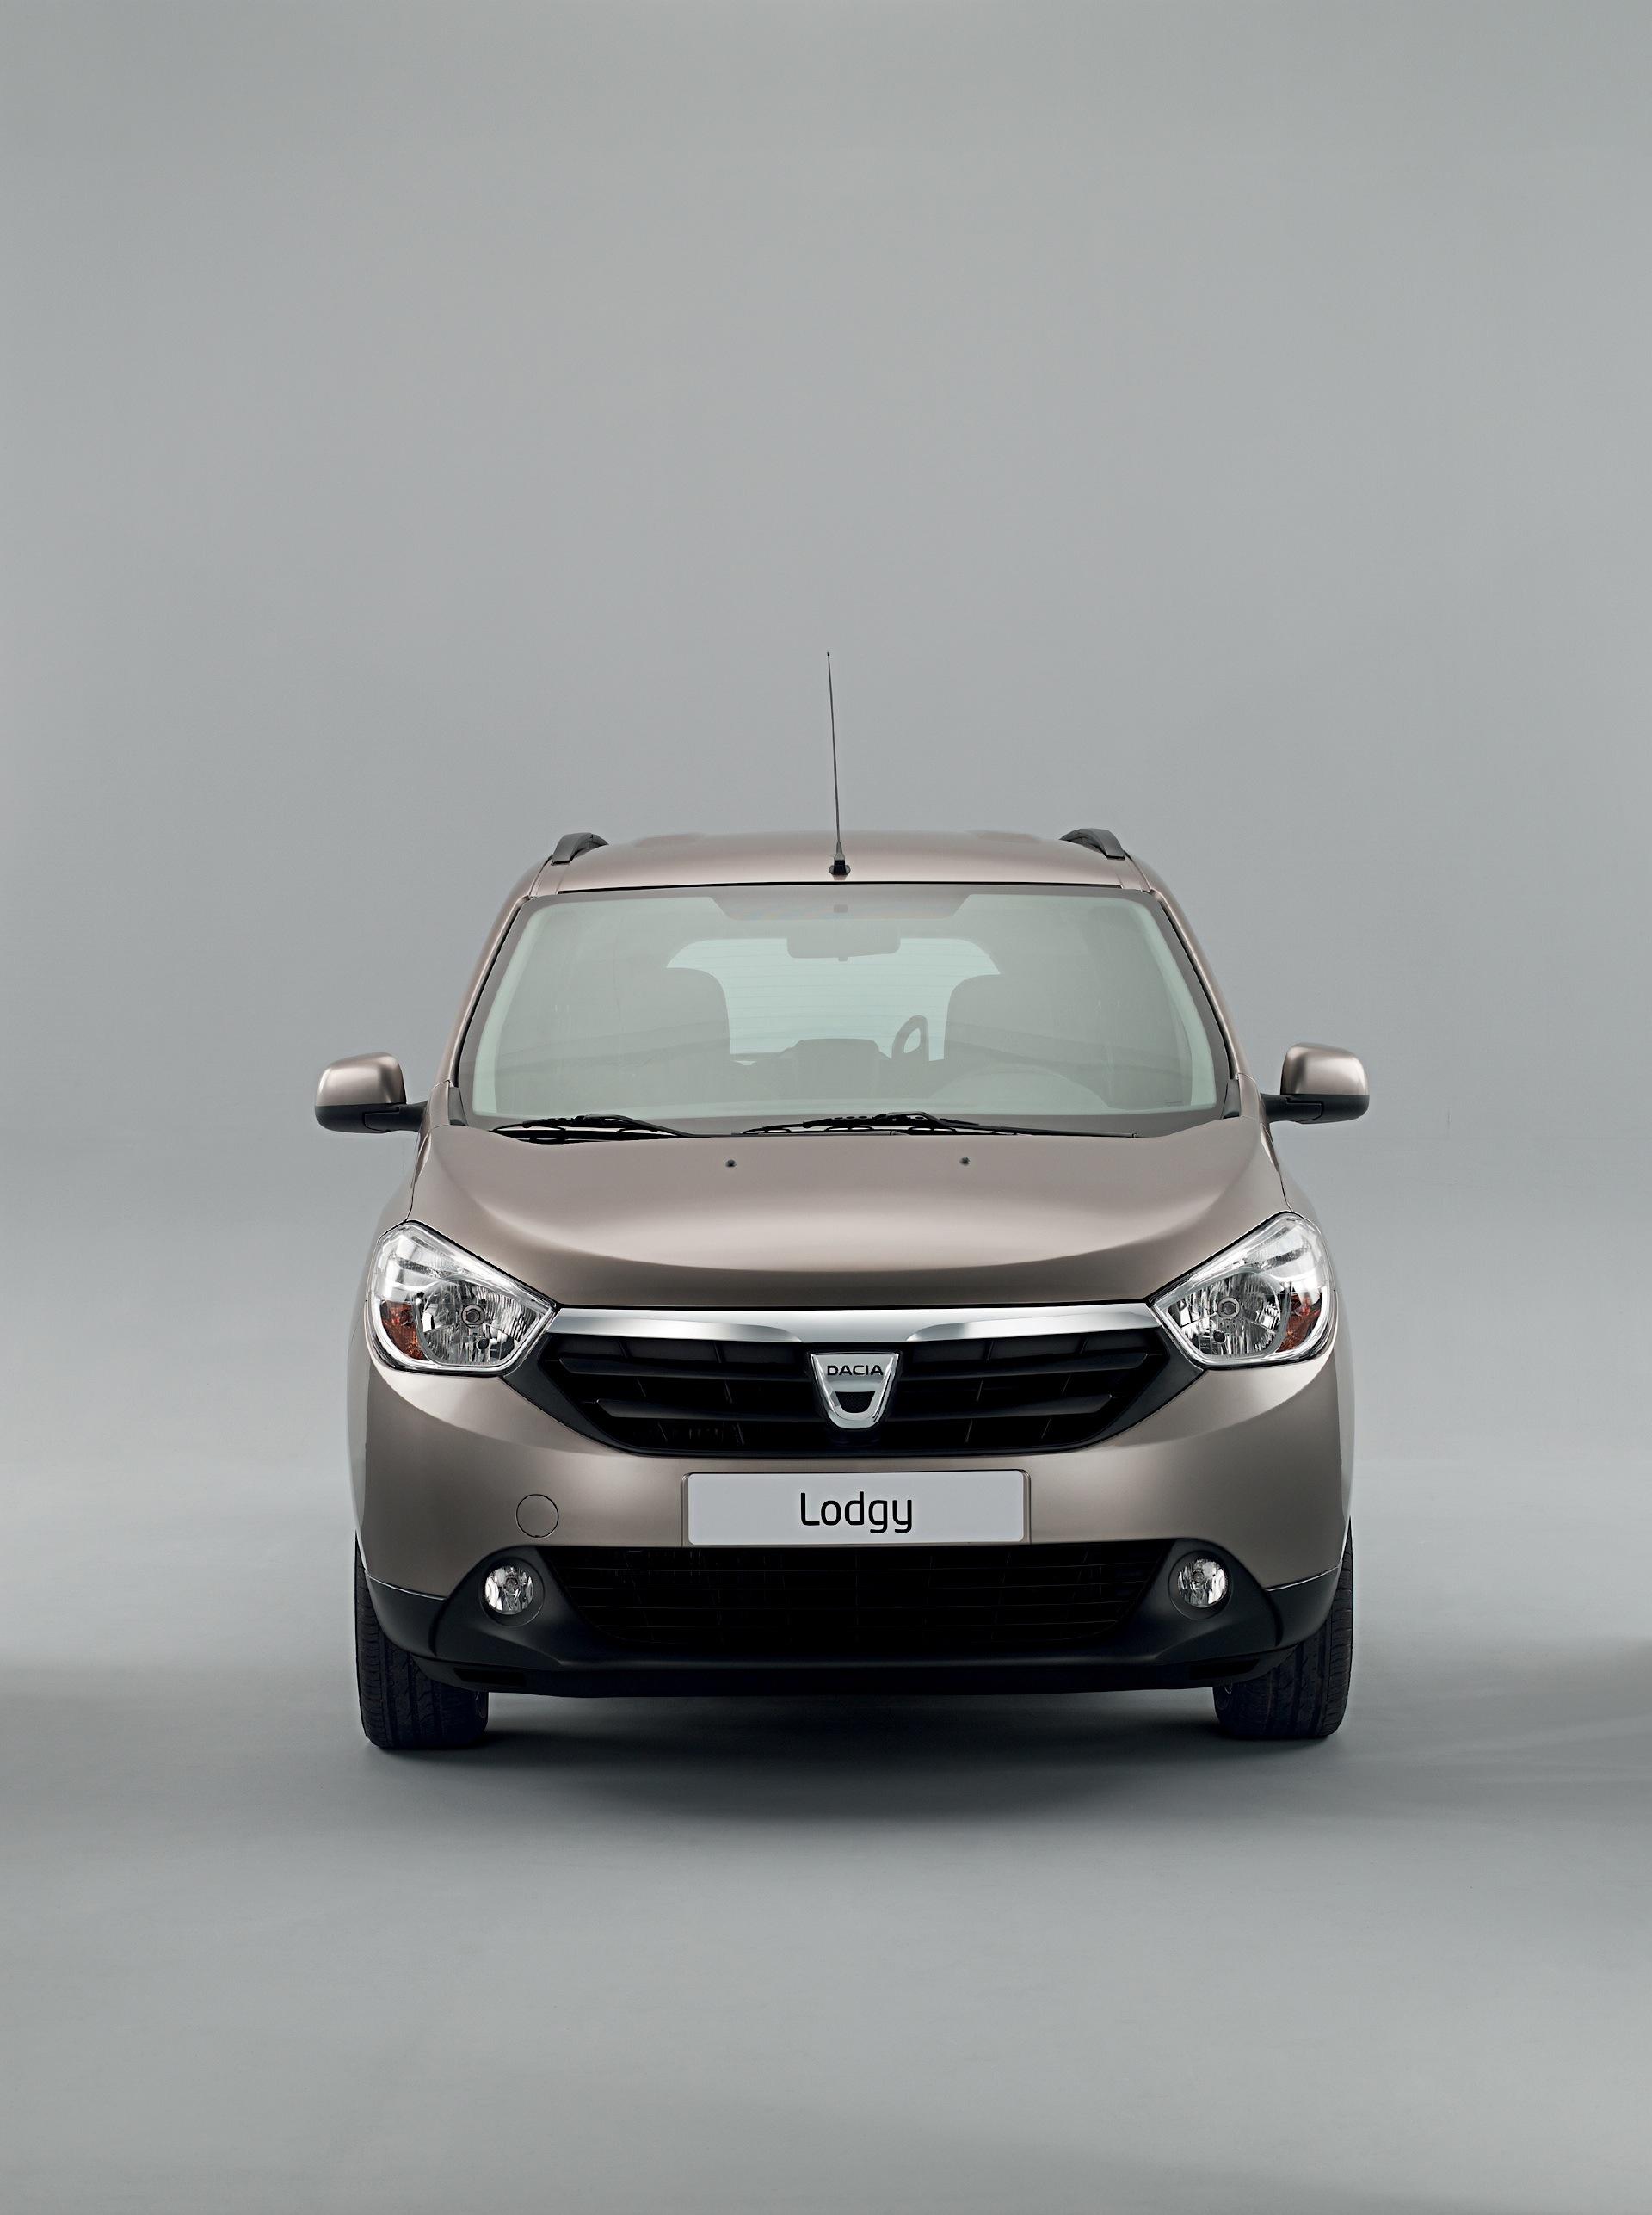 Dacia Sandero Specs >> DACIA Lodgy specs & photos - 2012, 2013, 2014, 2015, 2016, 2017, 2018 - autoevolution